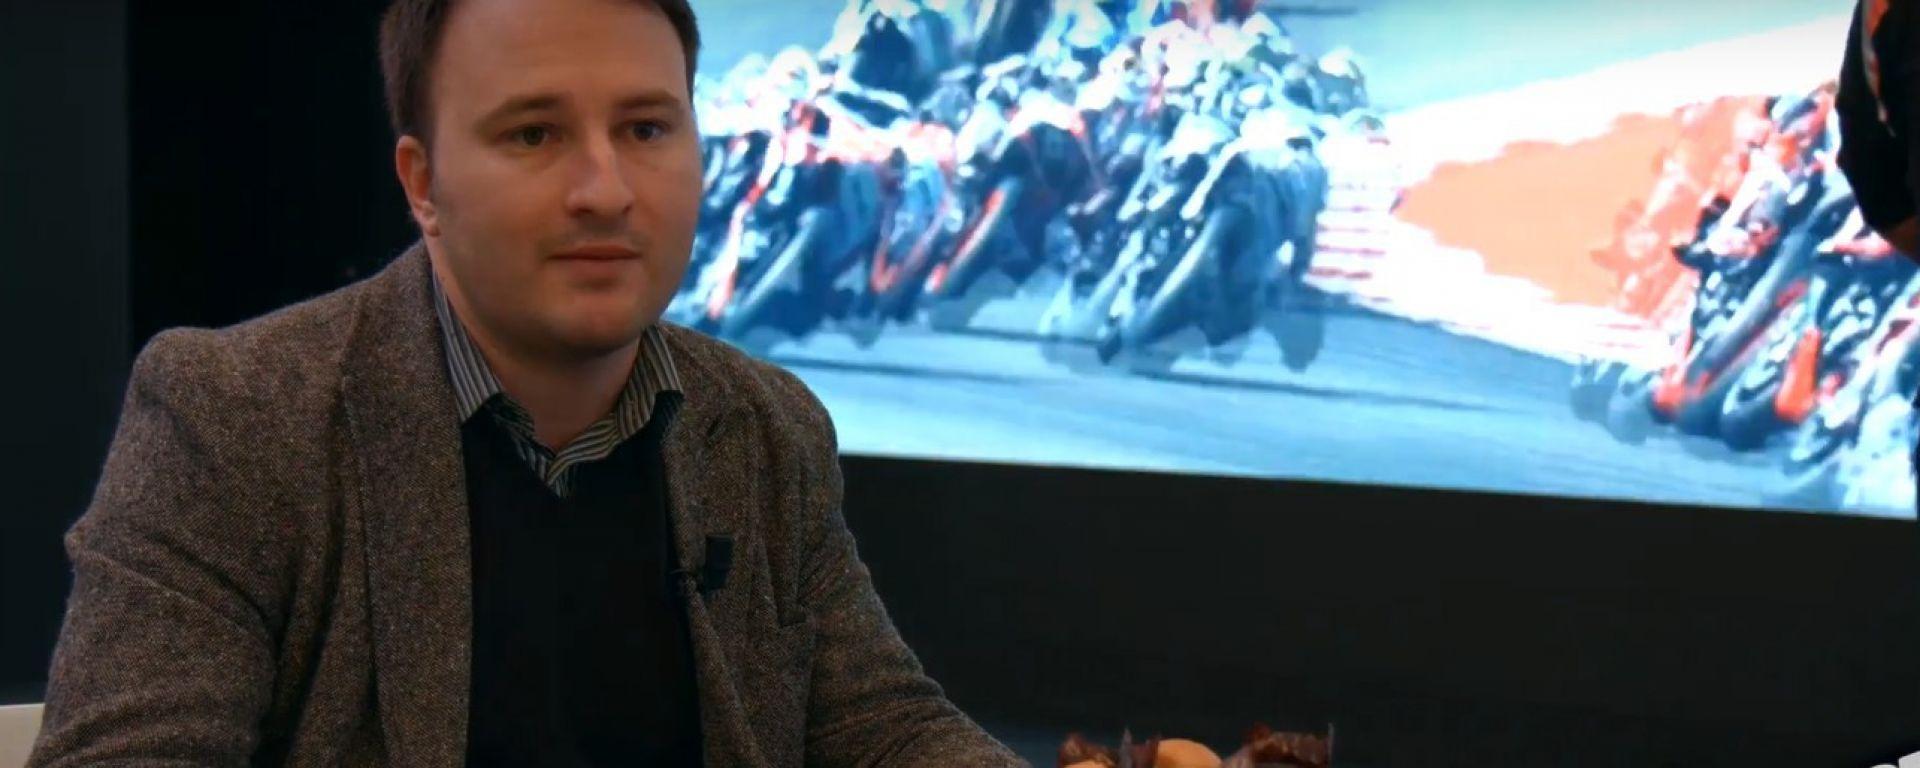 Diego Arioli, Responsabile Marketing Prodotto Moto Aprilia